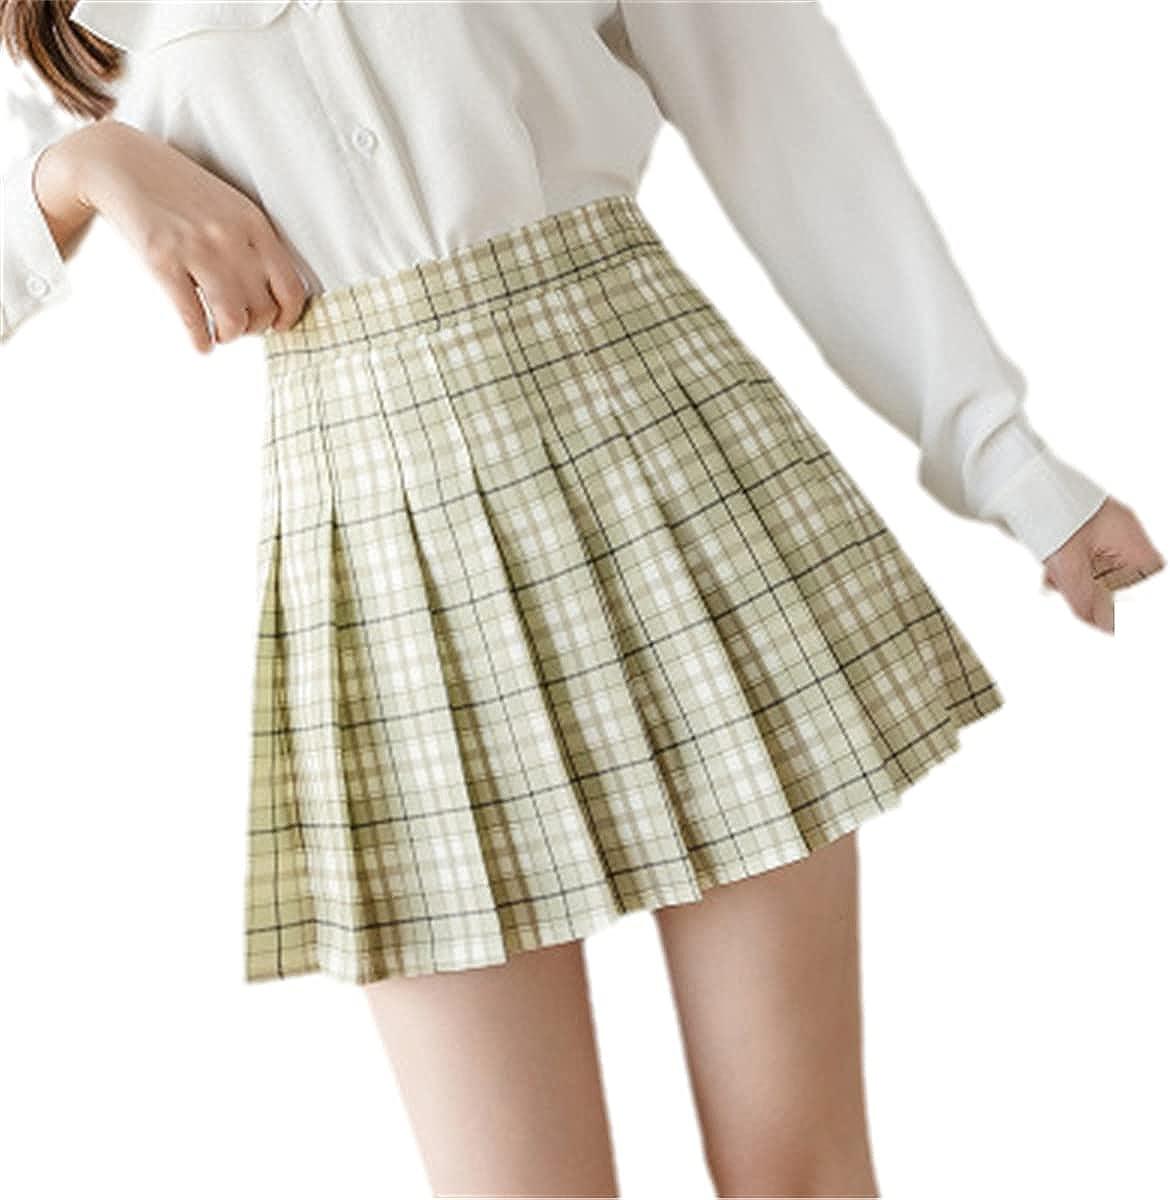 Japanese and Korean Short Skirt high Waist Mini Ladies Skirt Kawaii Pink Plaid Pleated Tennis Casual Skirt